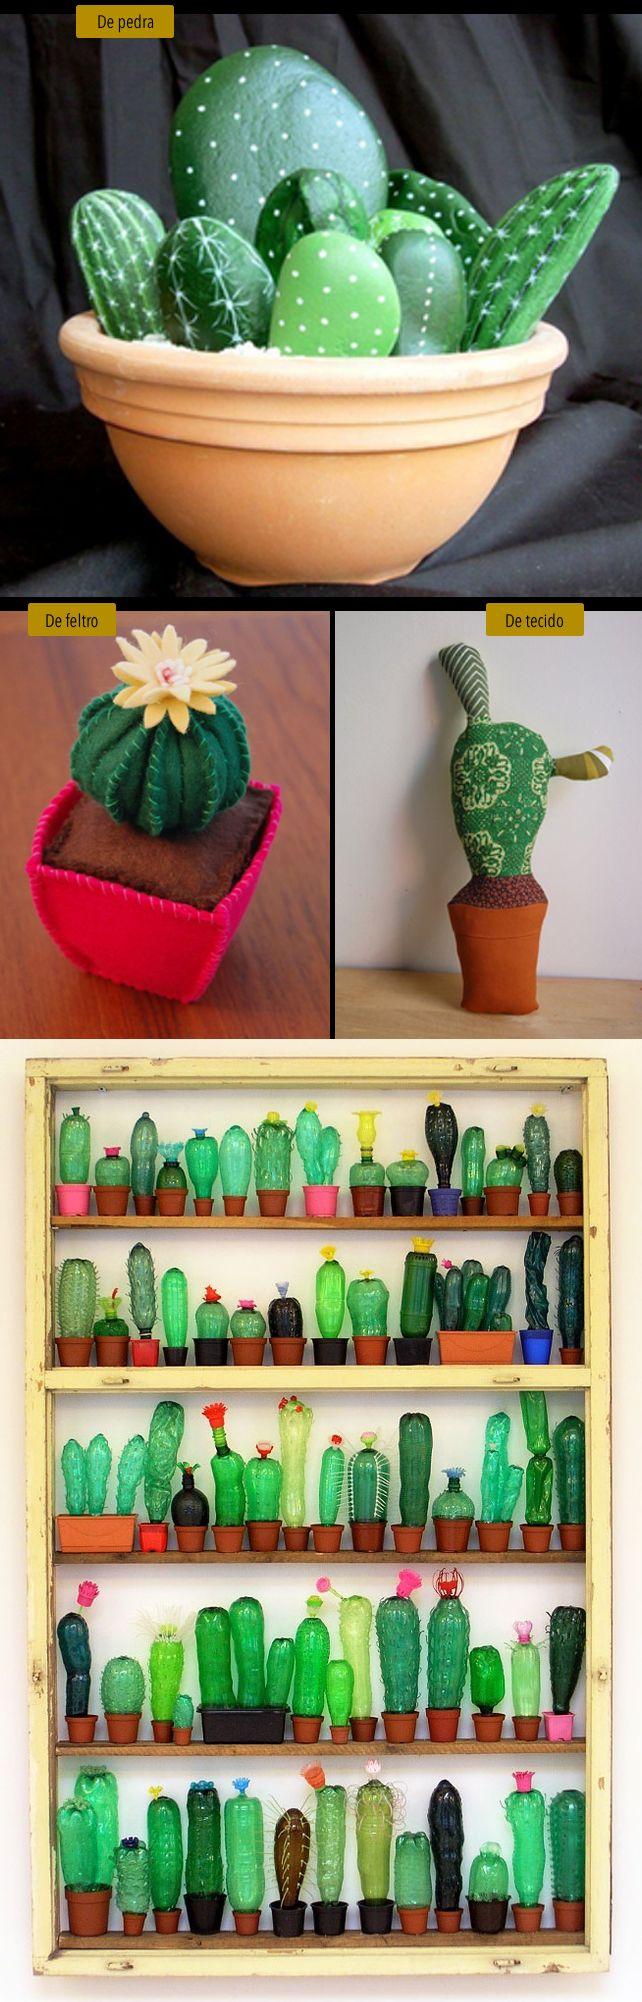 161 best cactus images on pinterest succulents prickly pear cactos de pedra feltro tecido e garrafas pet painted rock cactuseasy fandeluxe Image collections